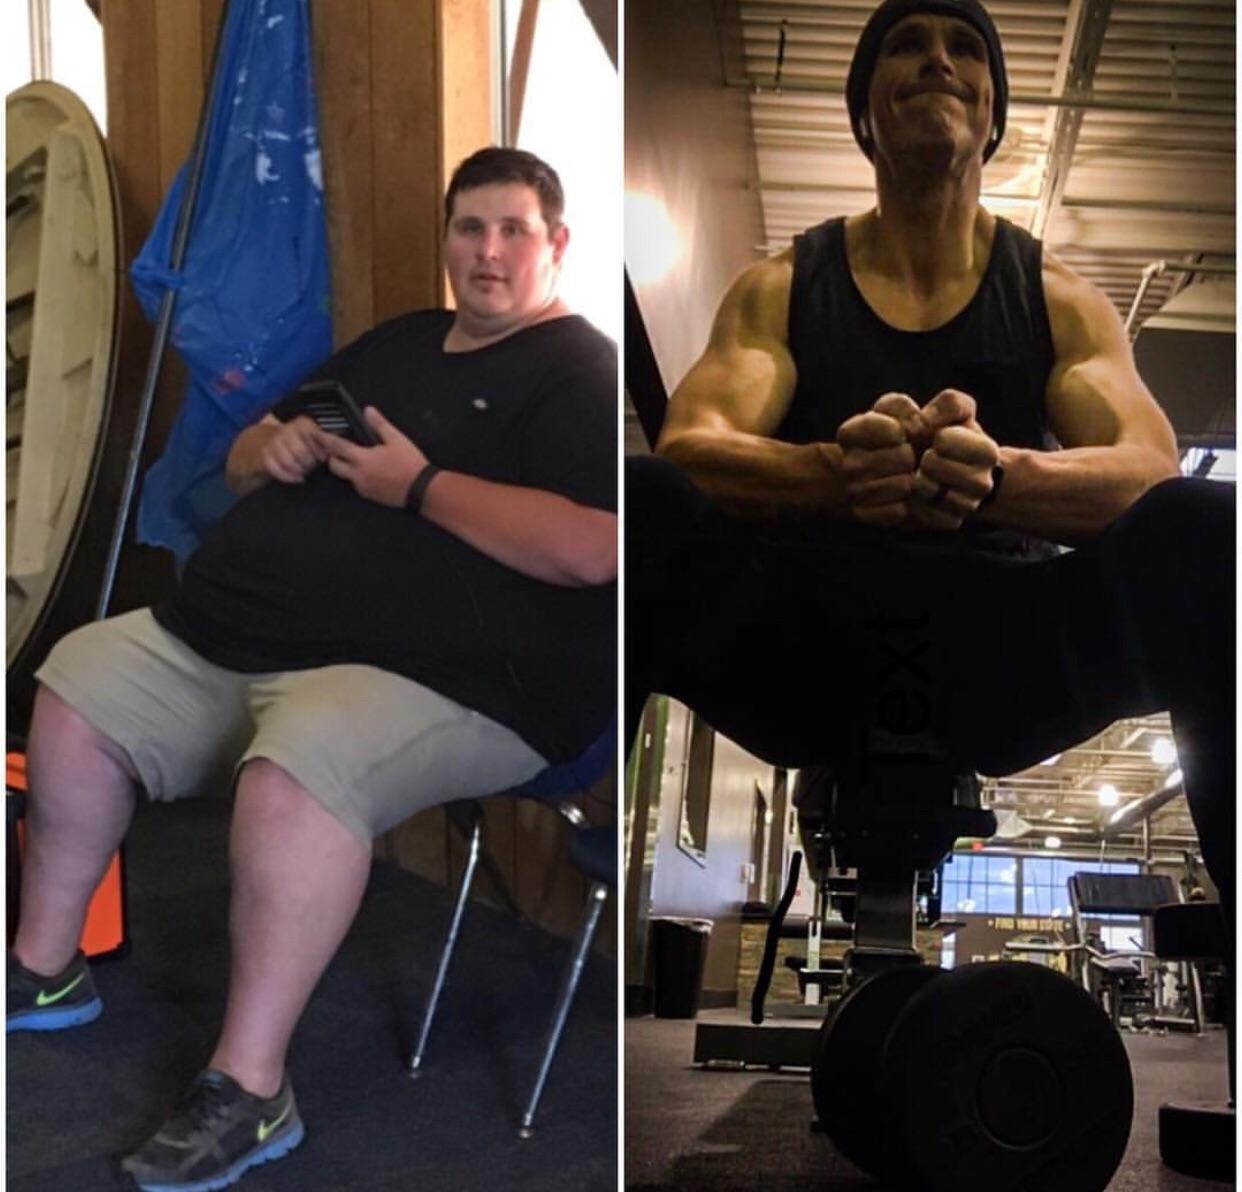 6'3 Male 317 lbs Weight Loss 534 lbs to 217 lbs